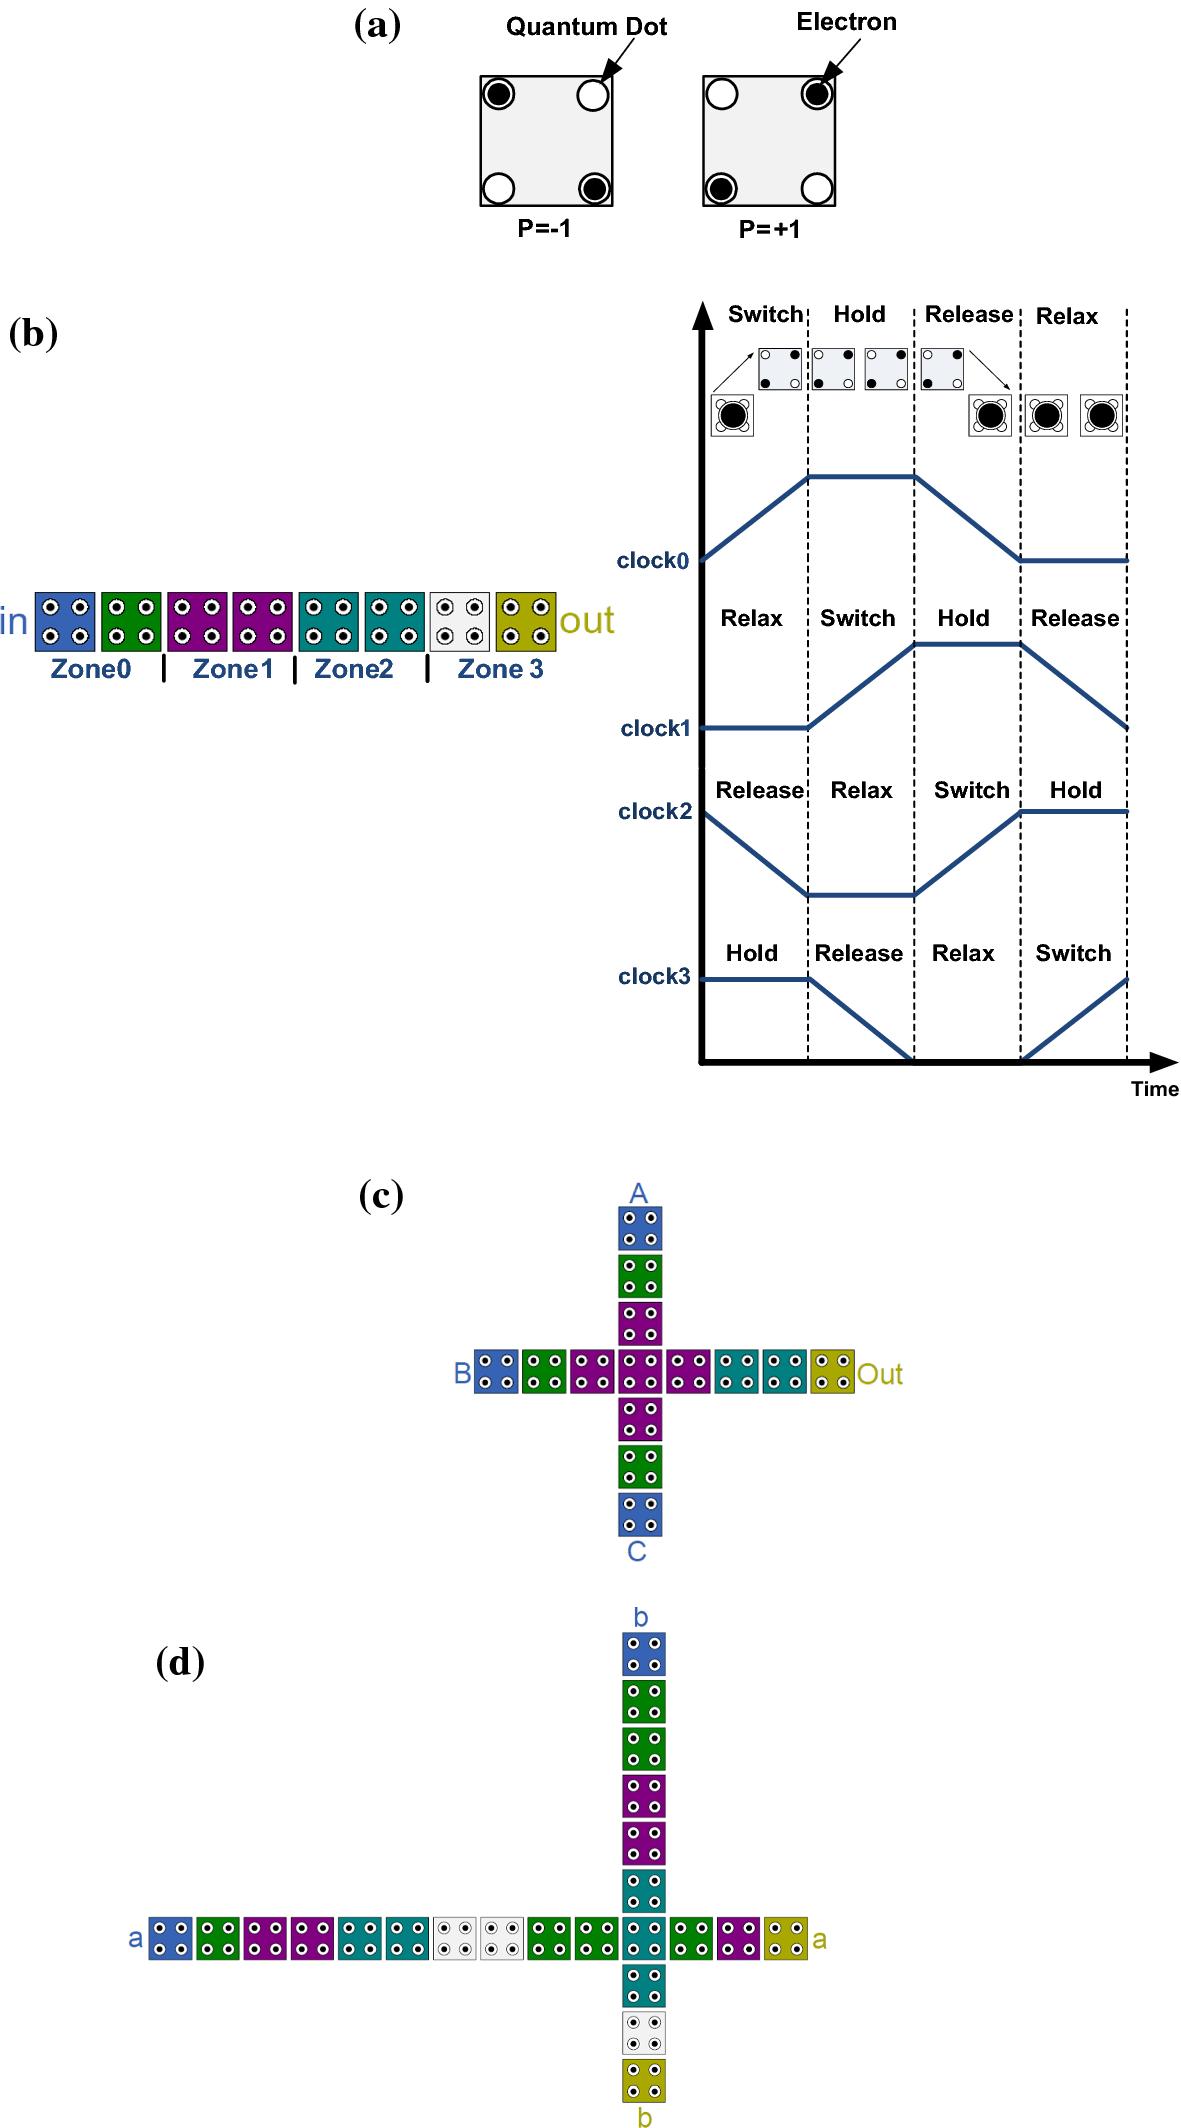 Design And Analysis Of Efficient Qca Reversible Adders Springerlink Circuit 2 Twobit Adder Open Image In New Window